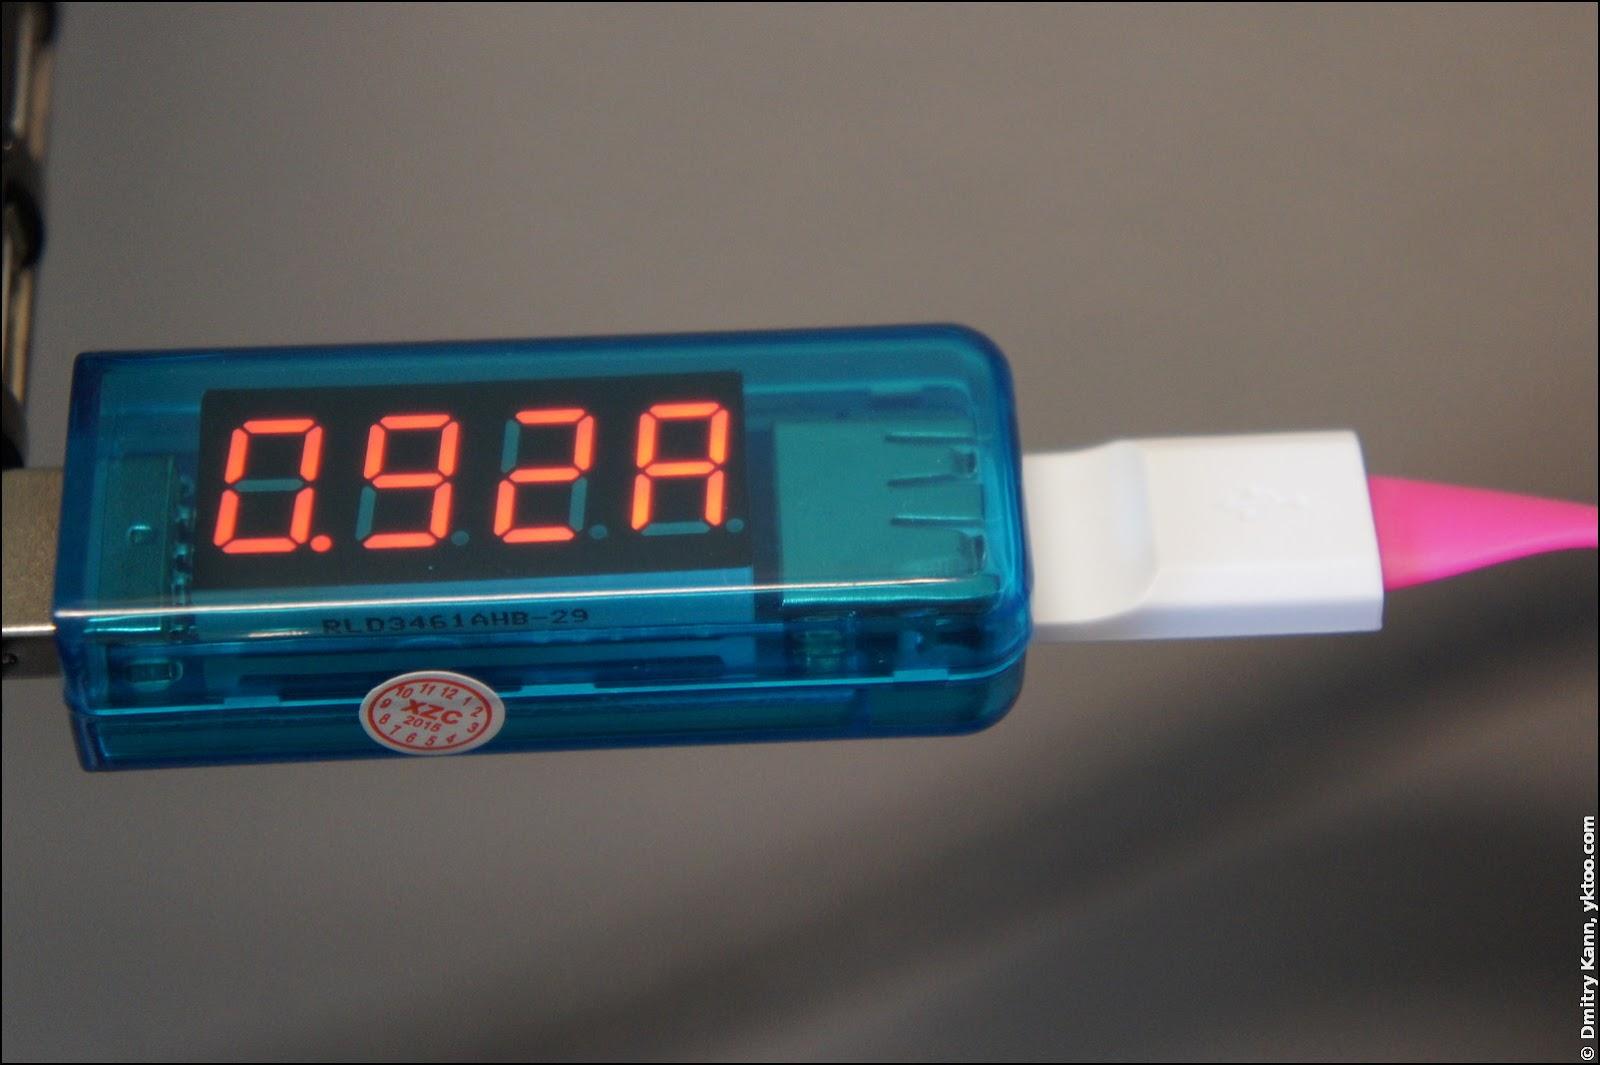 USB hub, current 0.92 A.